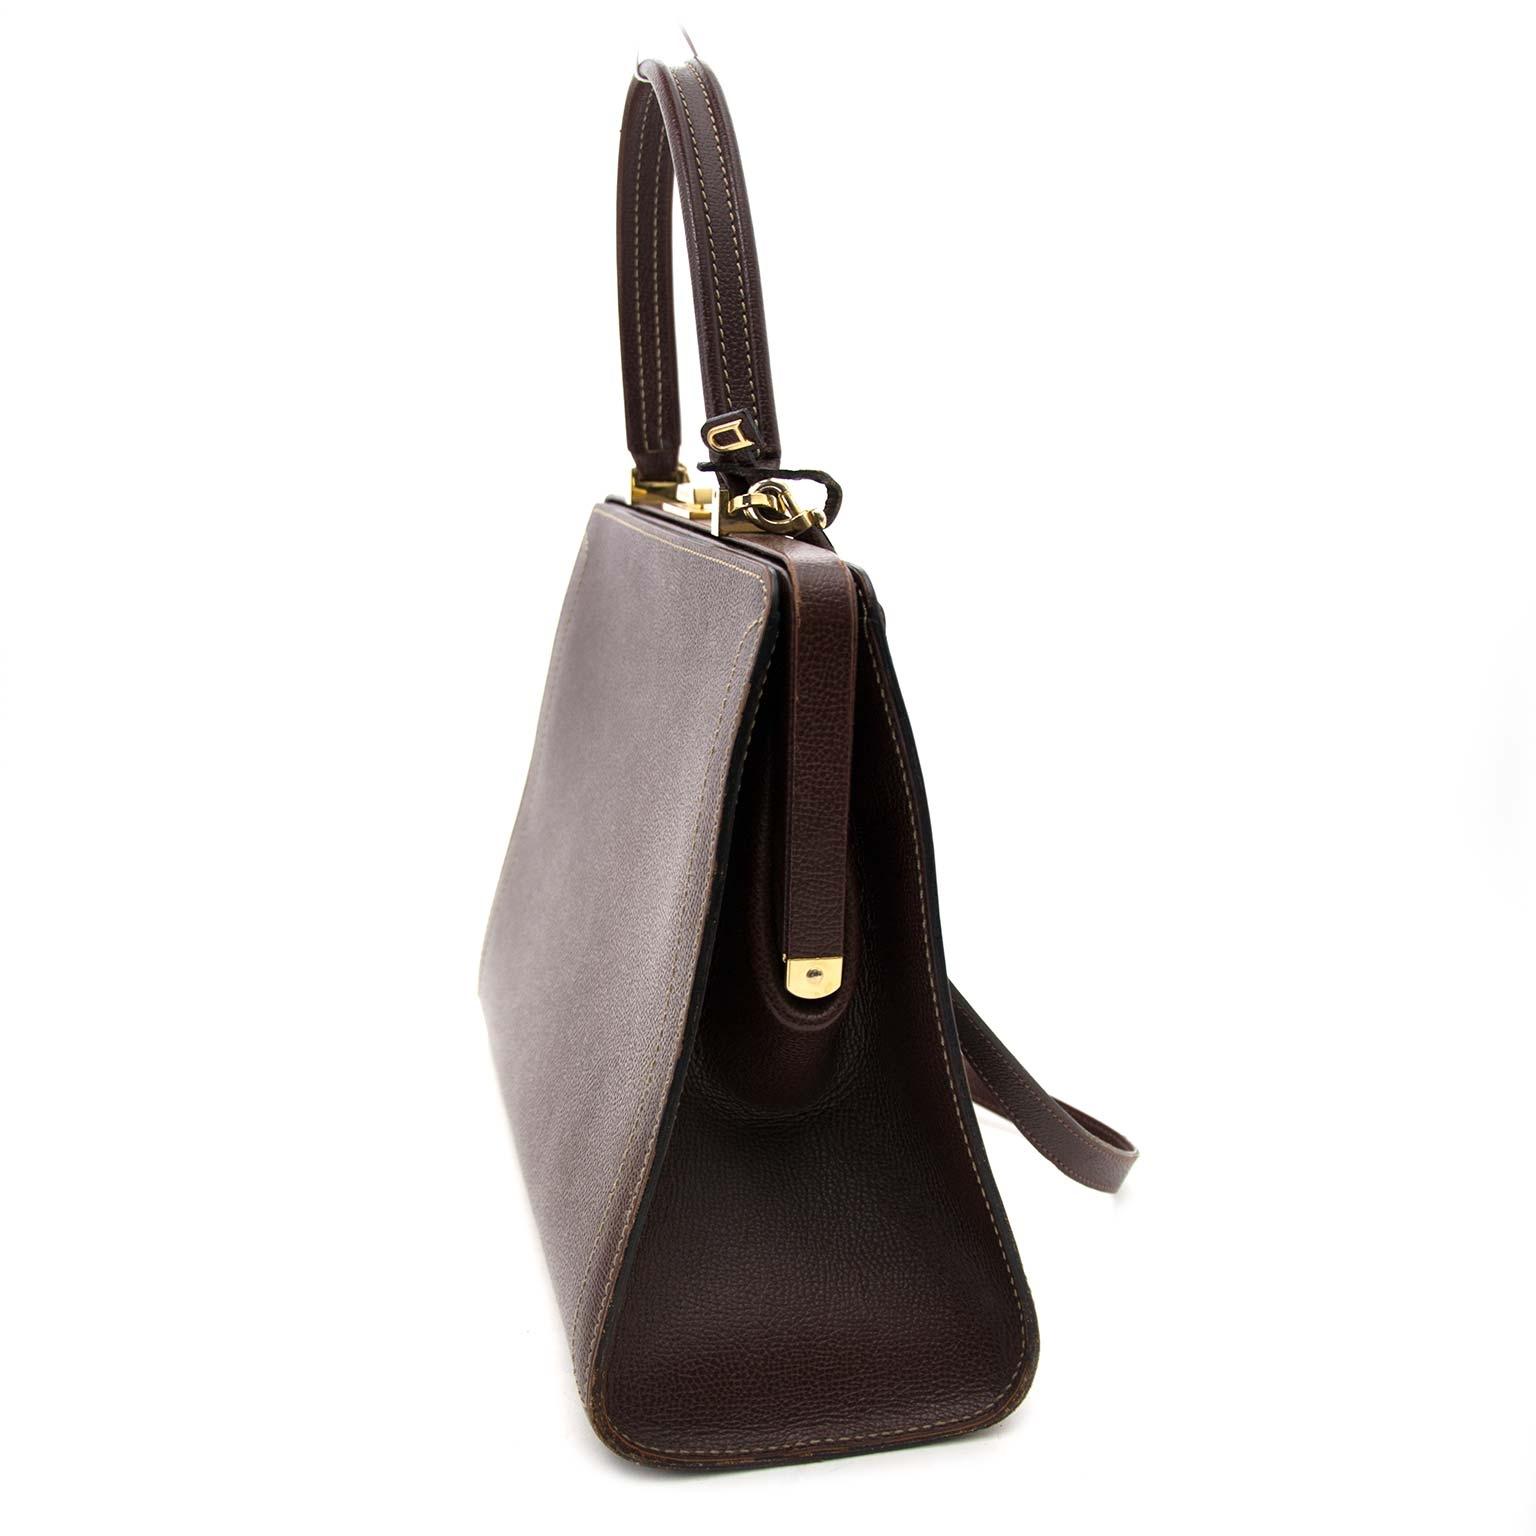 Delvaux Evasion Brown Leather Bag Buy authentic designer Delvaux secondhand bags at Labellov at the best price. Safe and secure shopping. Koop tweedehands authentieke Delvaux tassen bij designer webwinkel labellov.